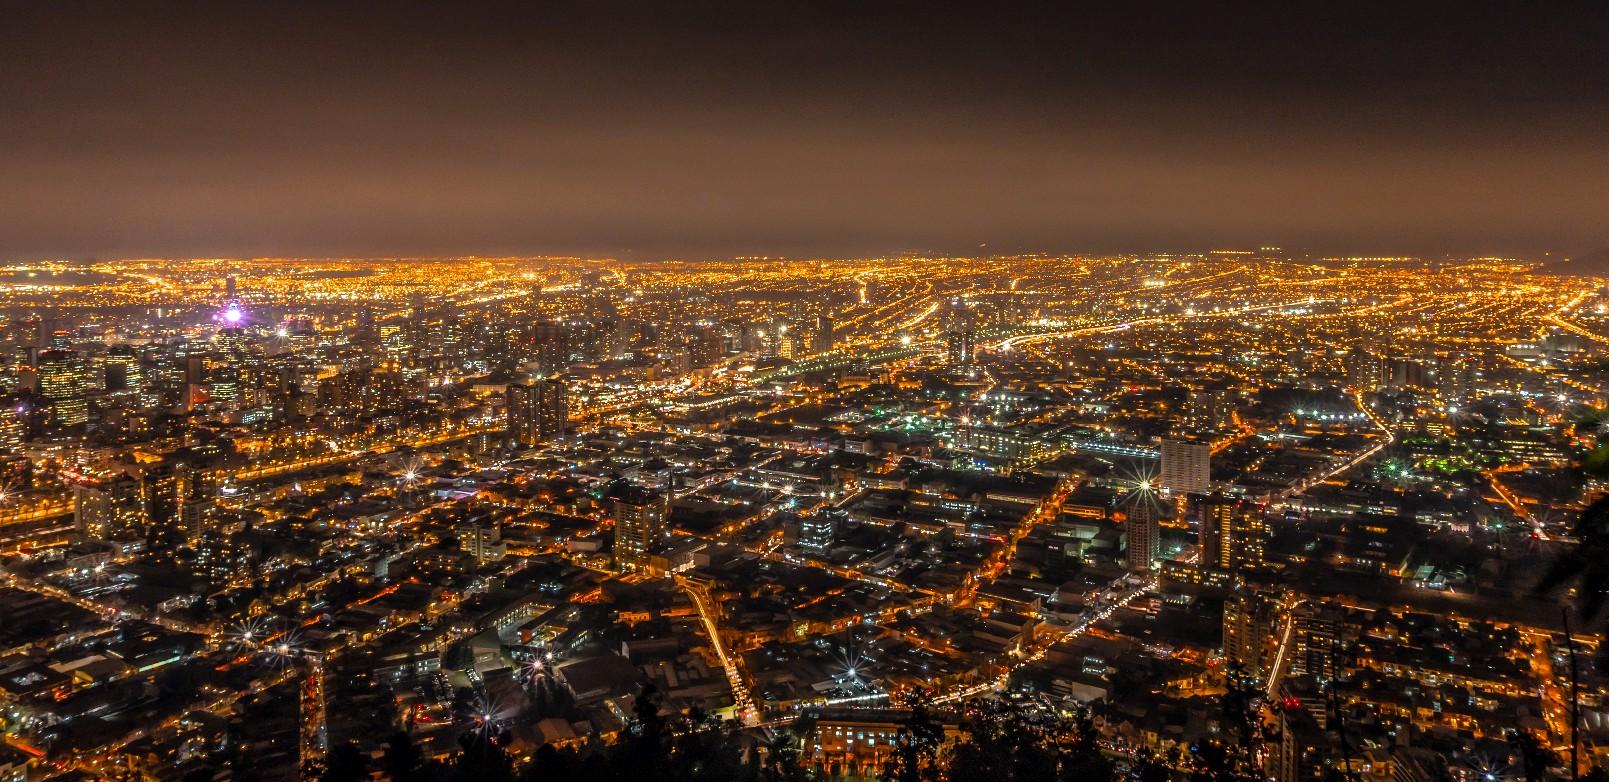 Vista noturna de Santiago (Boris G. / Flickr. Creative Commons)